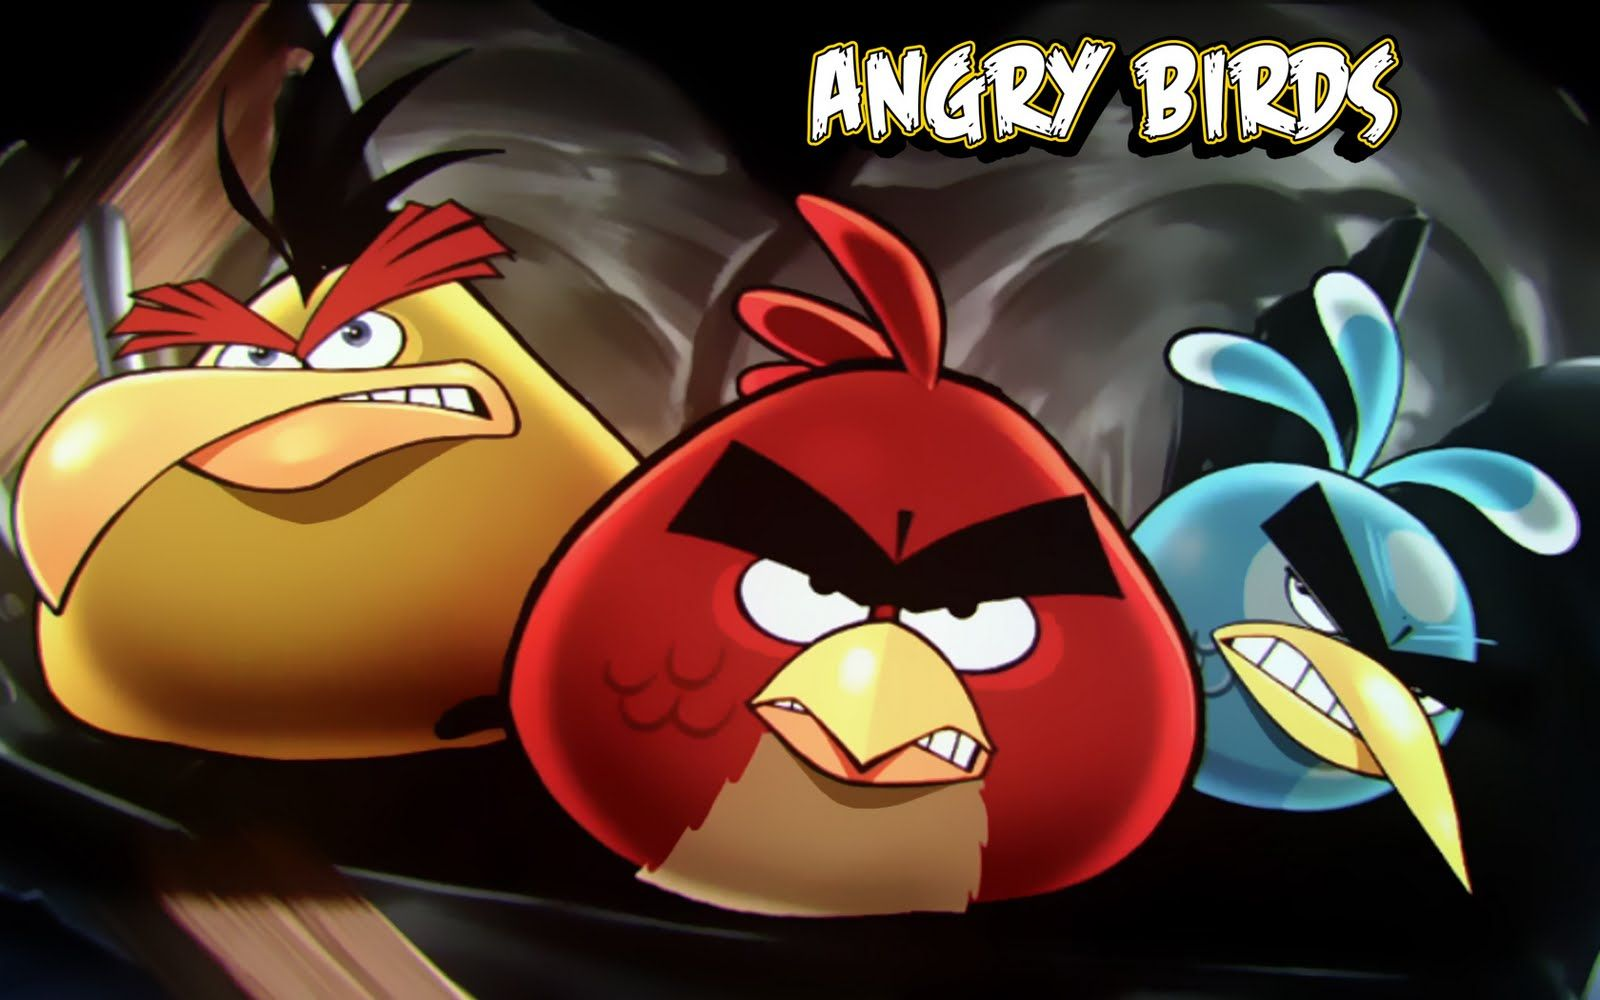 angry birds hd wallpaper free desktop wallpapers 2013 | ideas para